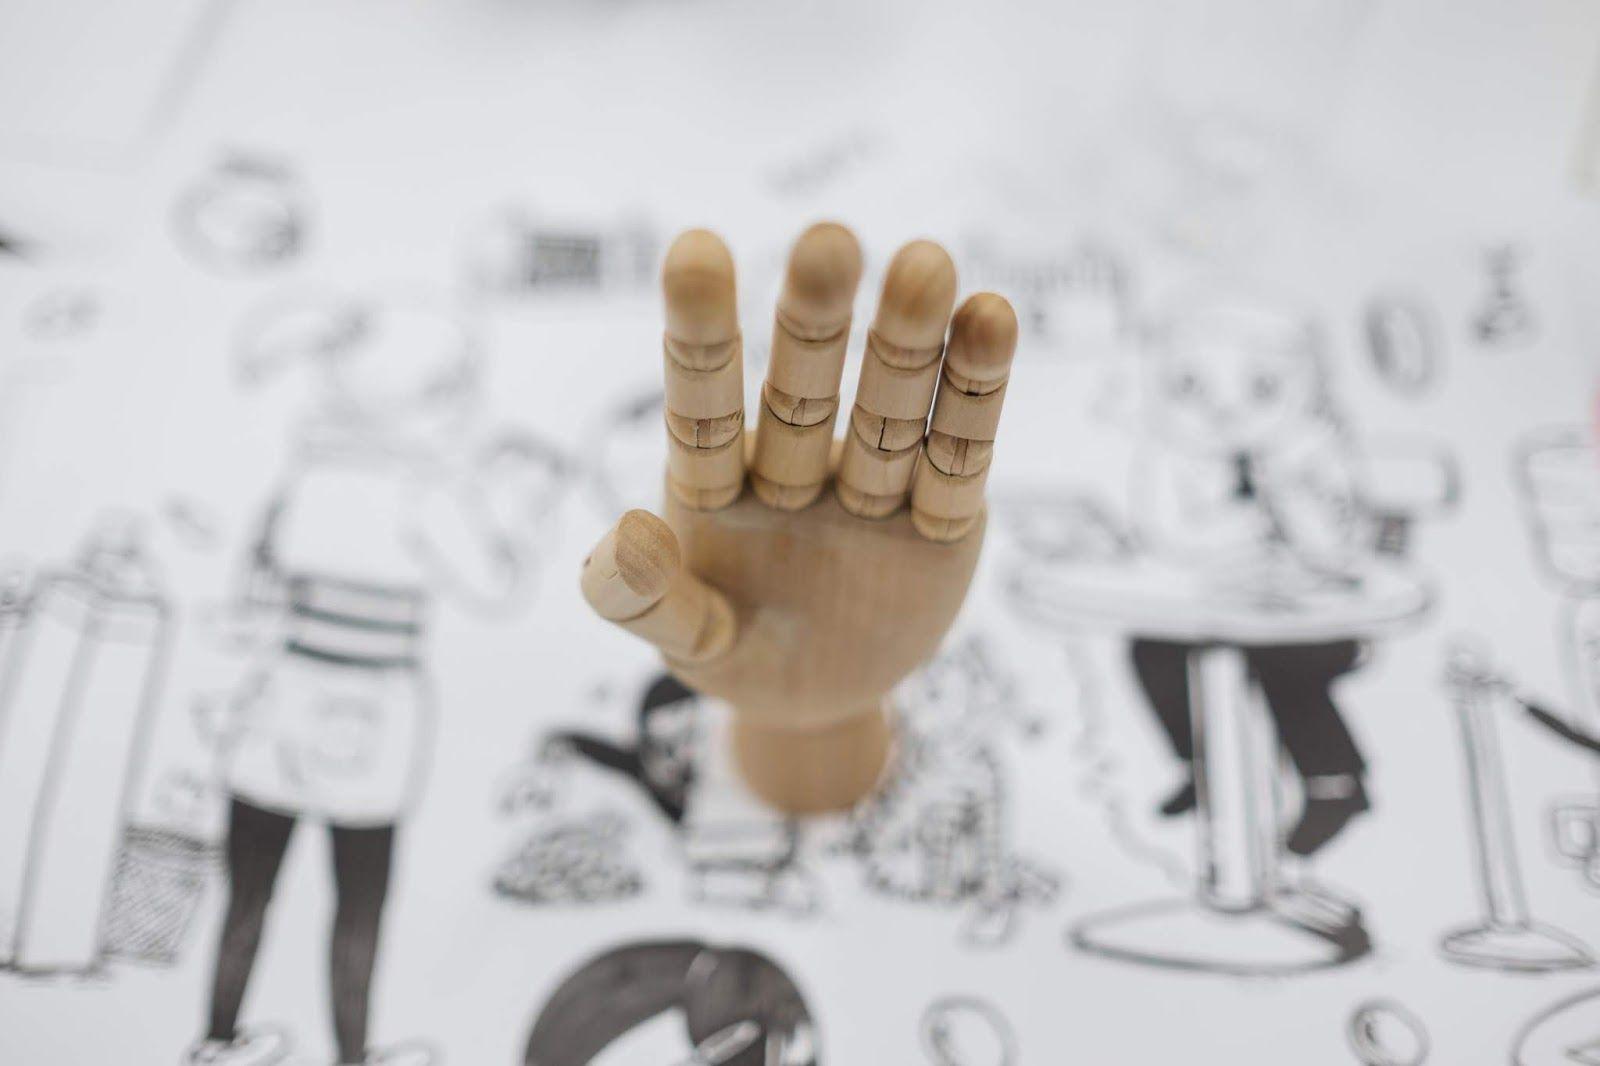 Terapie prin arta si violenta domestica mana